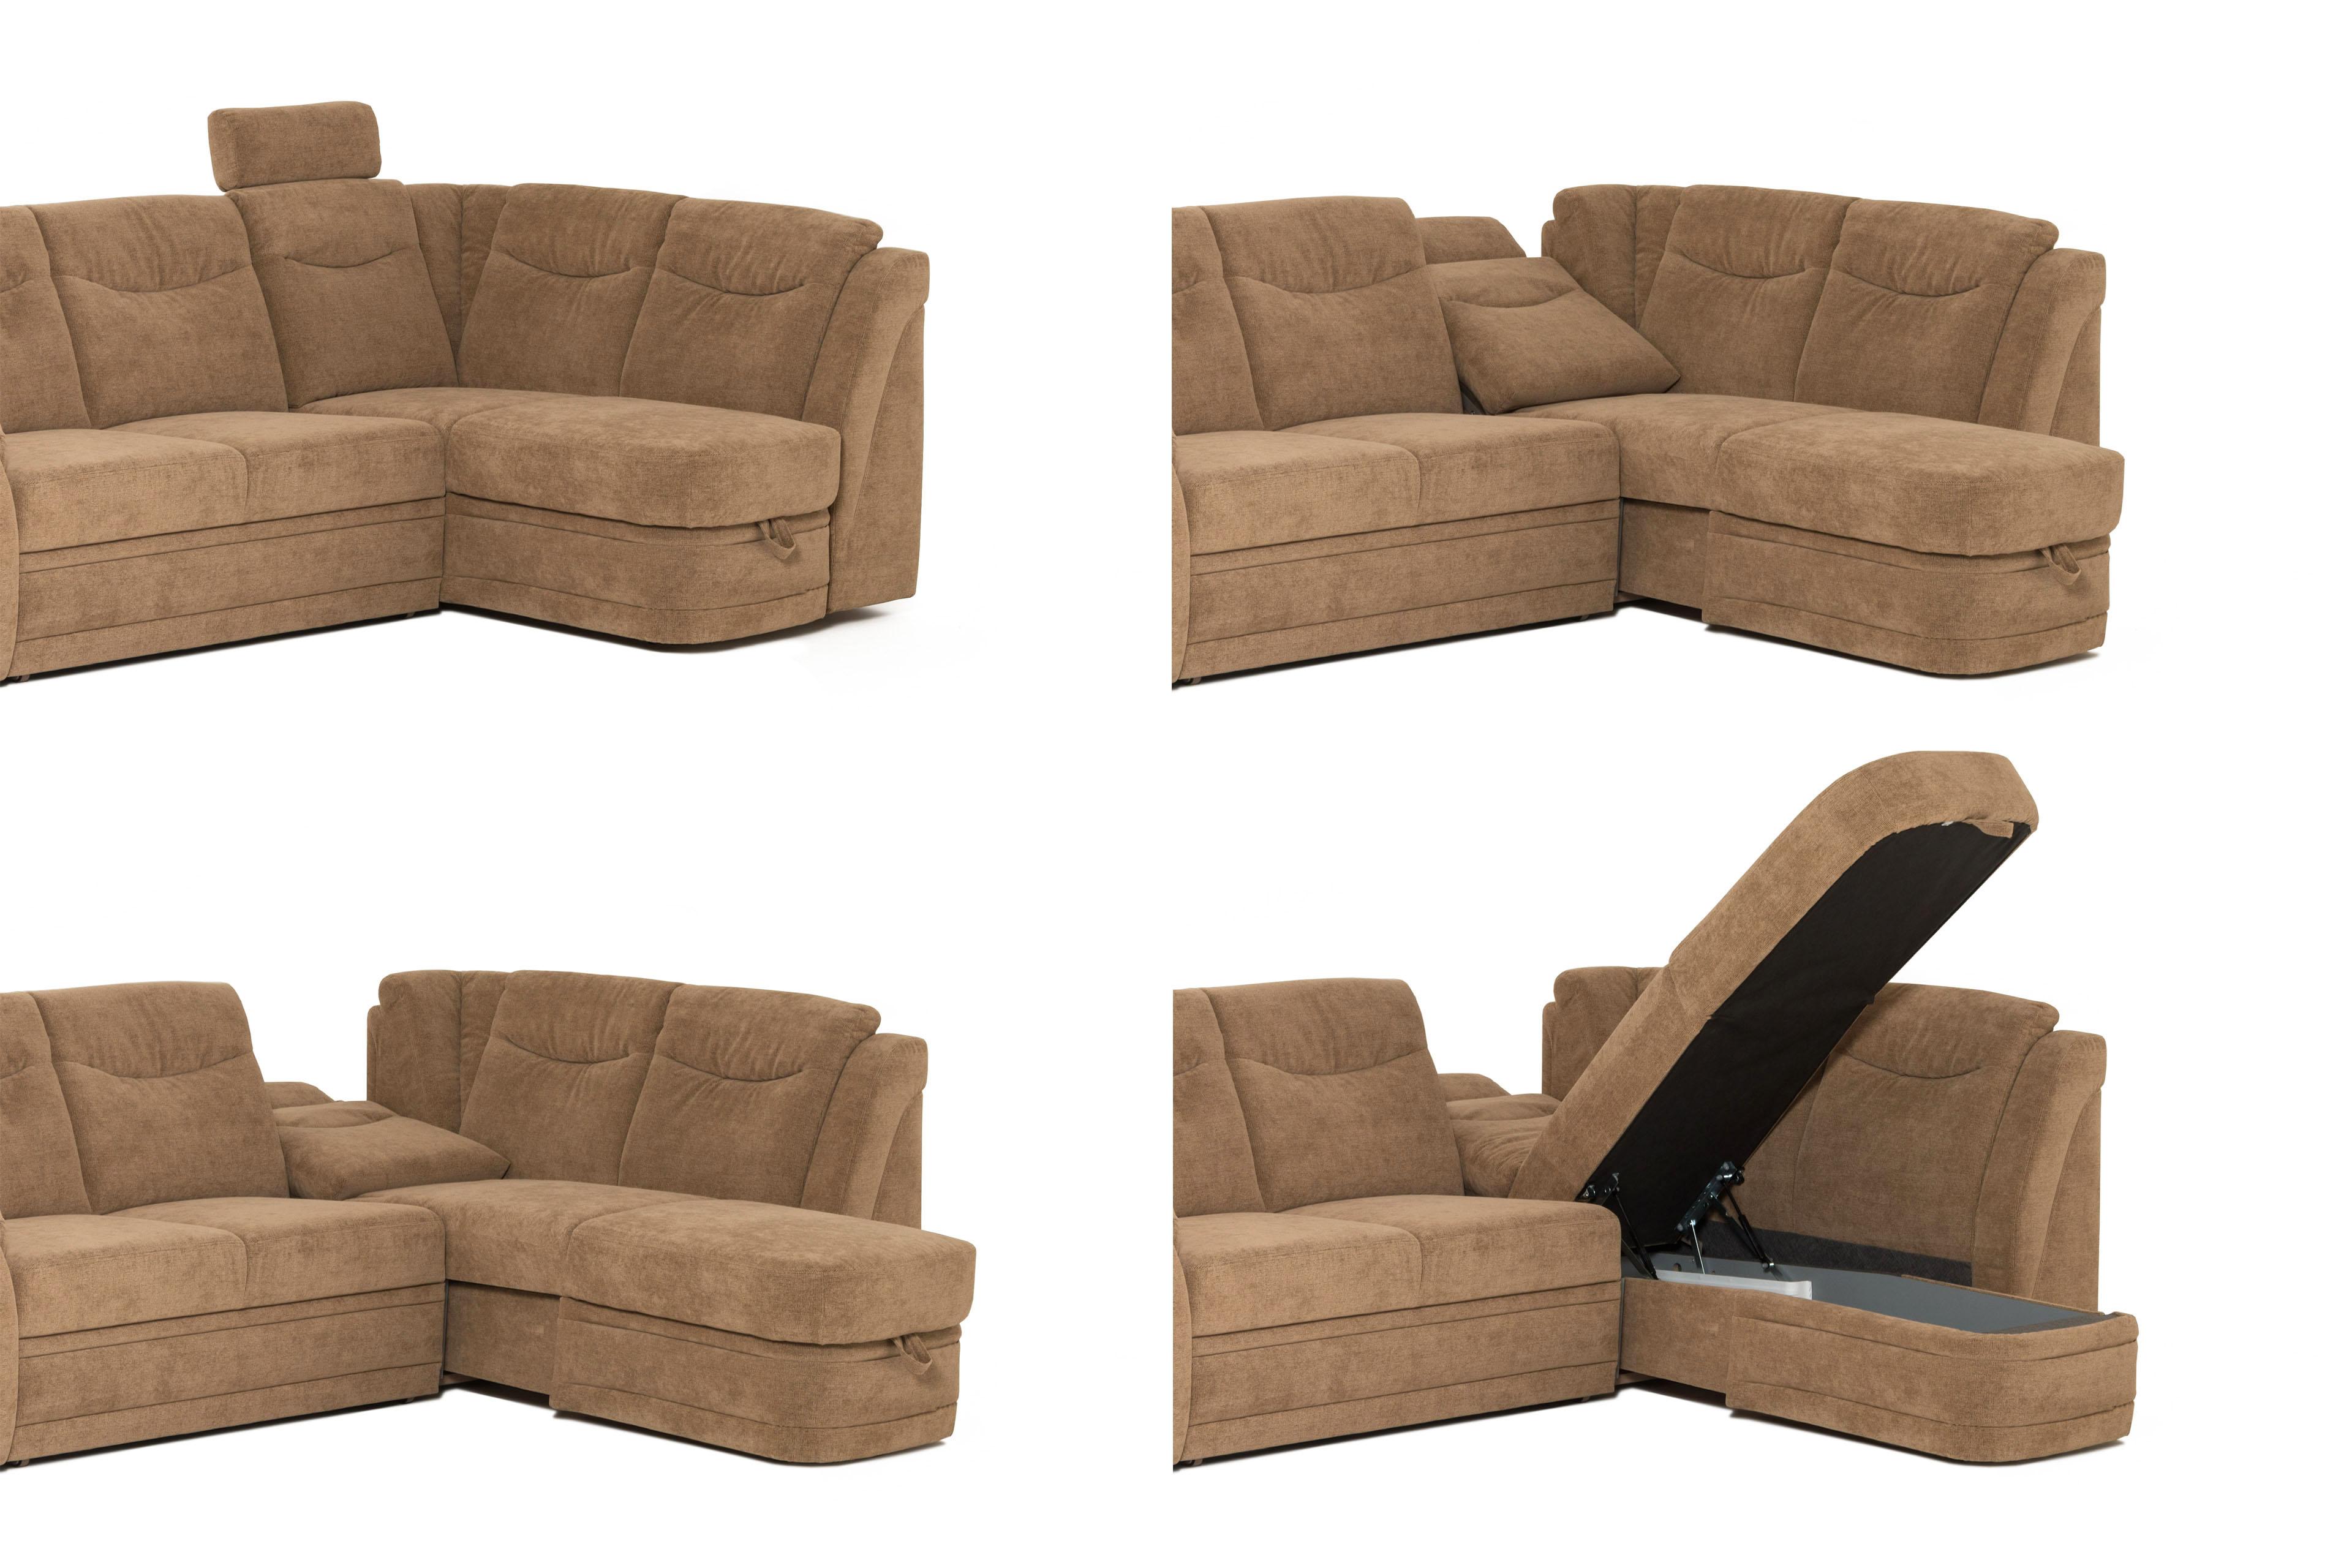 pm oelsa ecksofa saskia in beige m bel letz ihr online shop. Black Bedroom Furniture Sets. Home Design Ideas